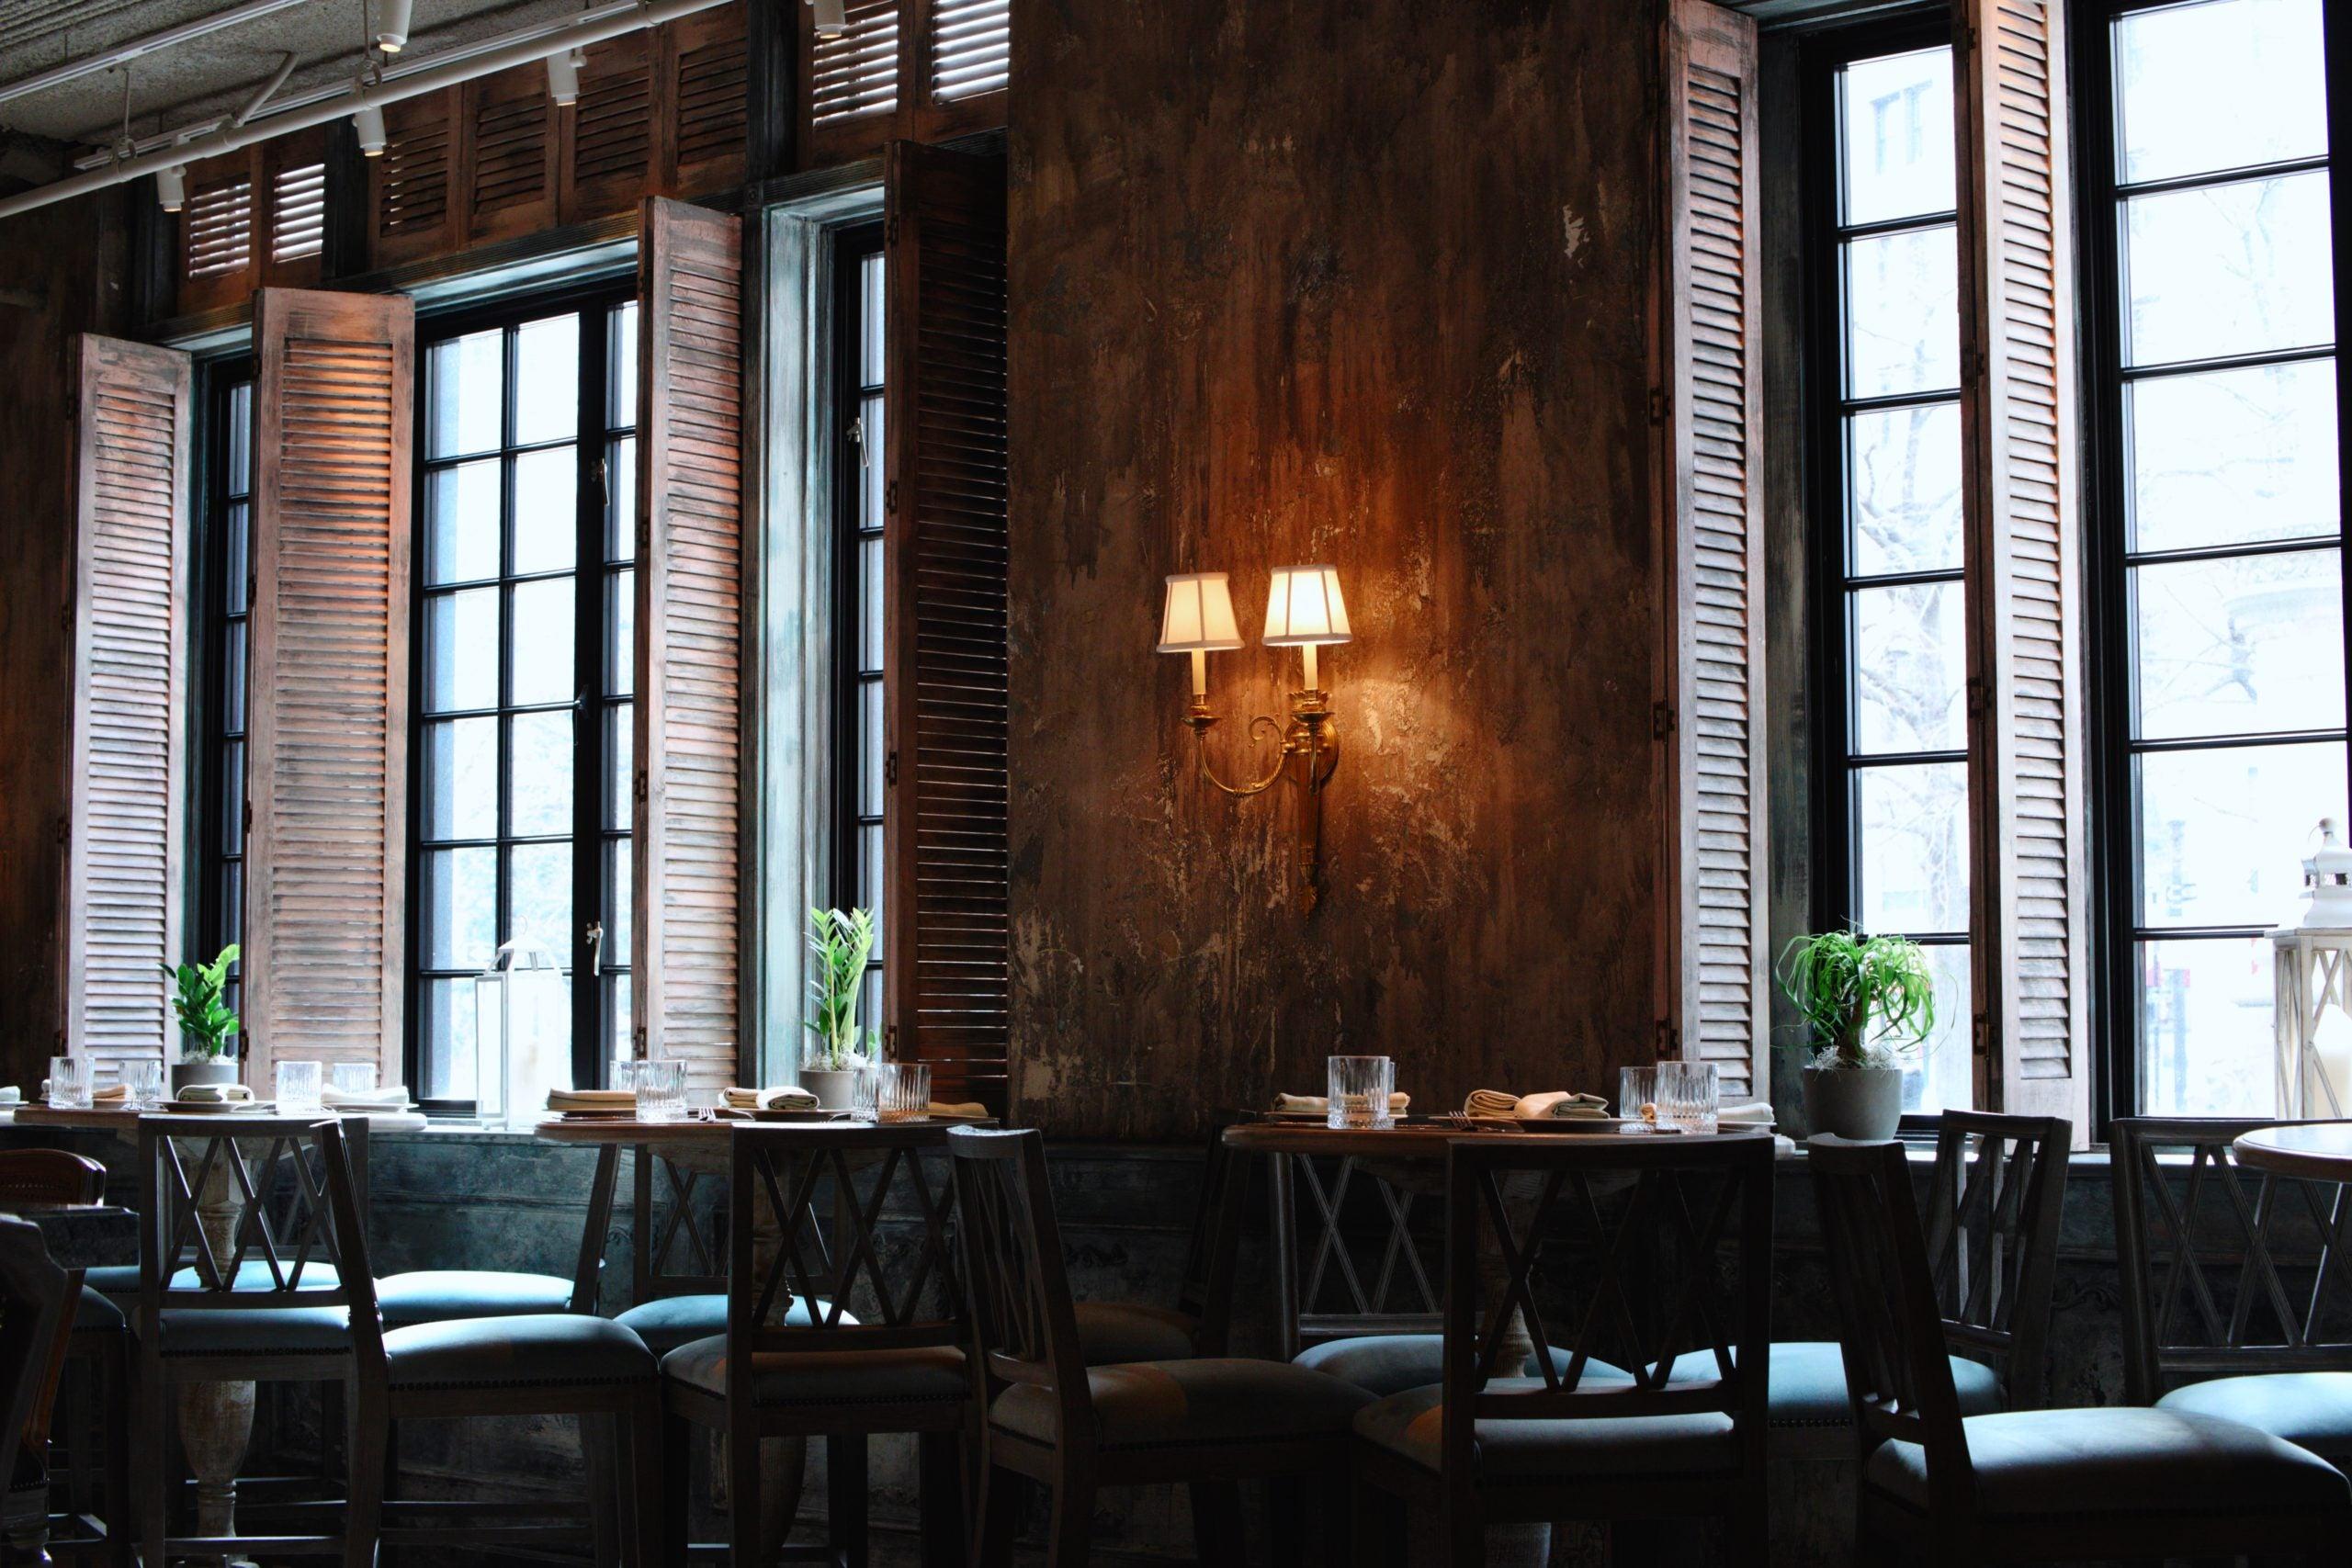 Mariel restaurant interior